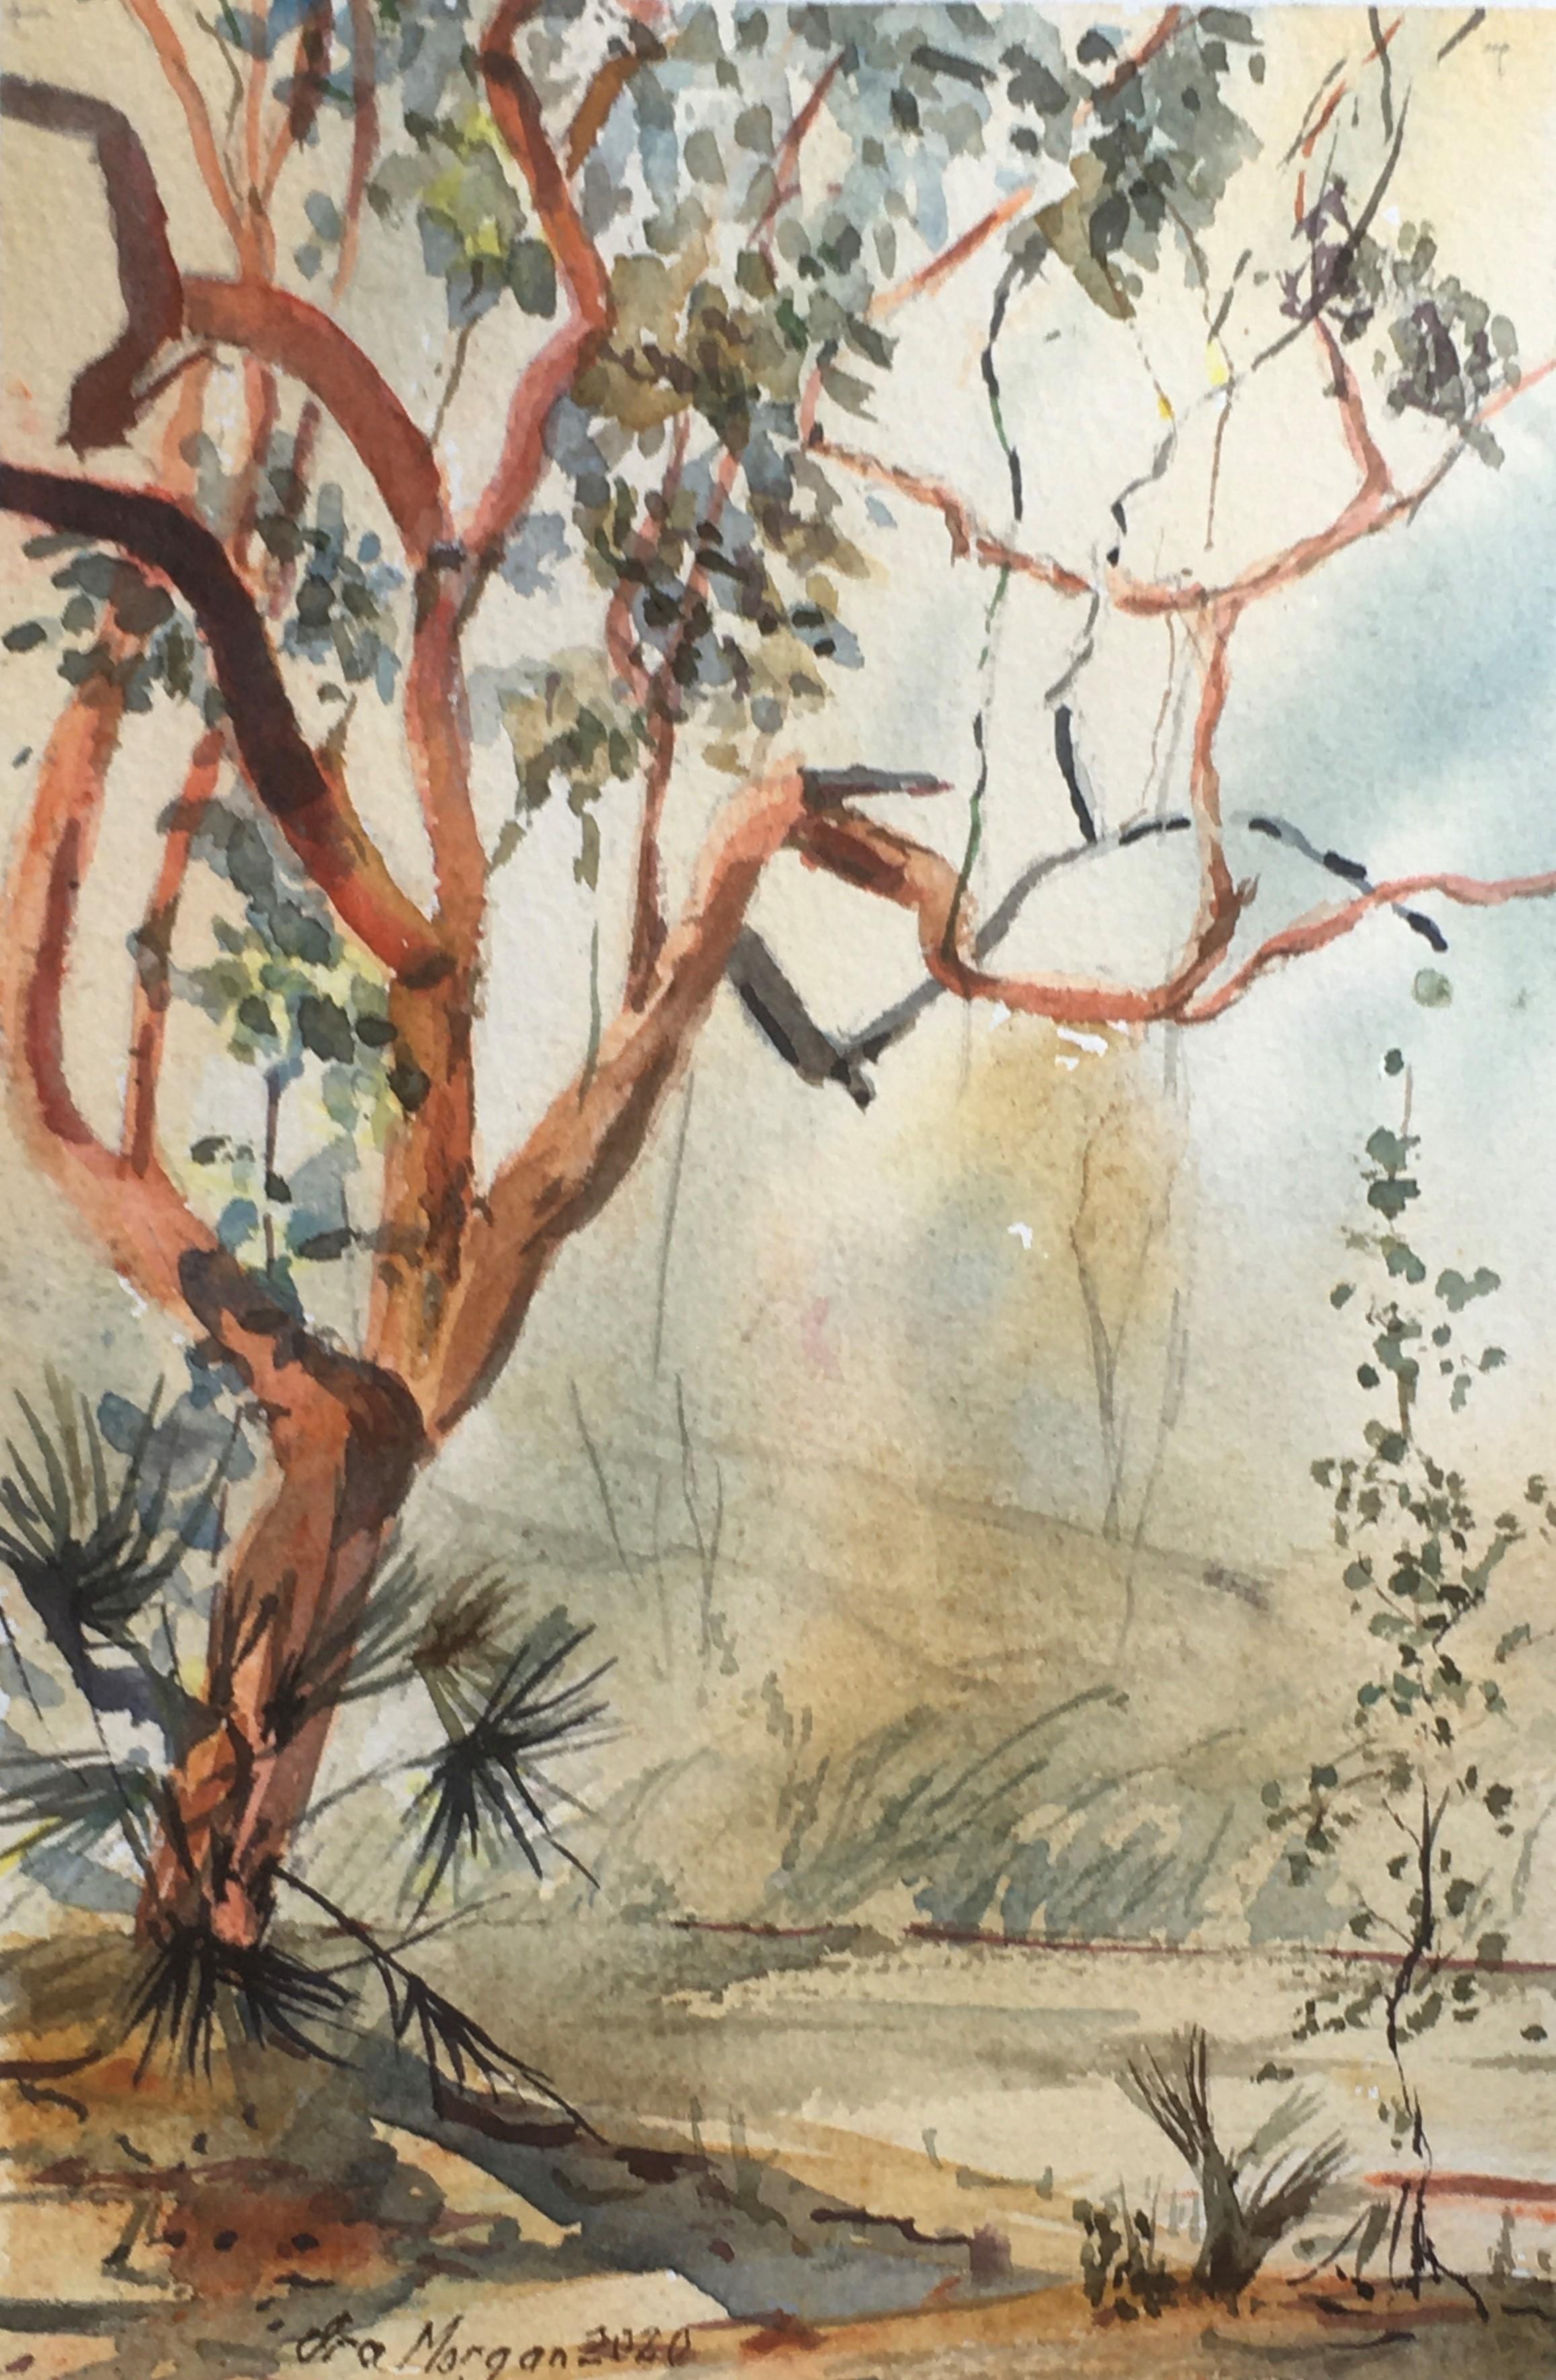 583. 'The Bright Orange Tree'